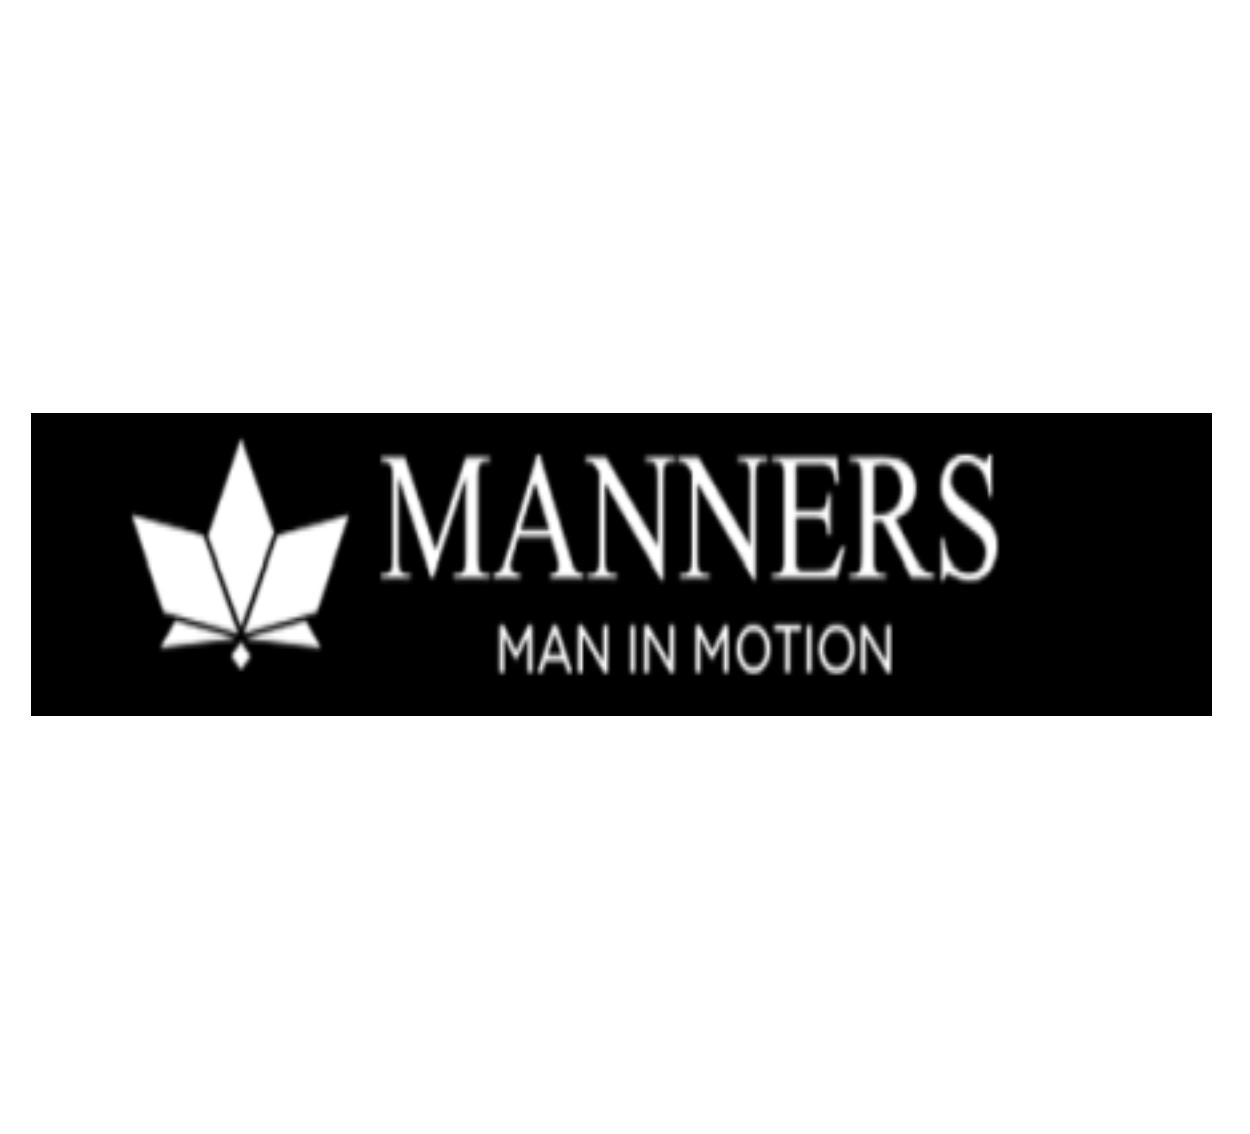 https://kkspars.com/web/wp-content/uploads/2021/04/manners-1.png